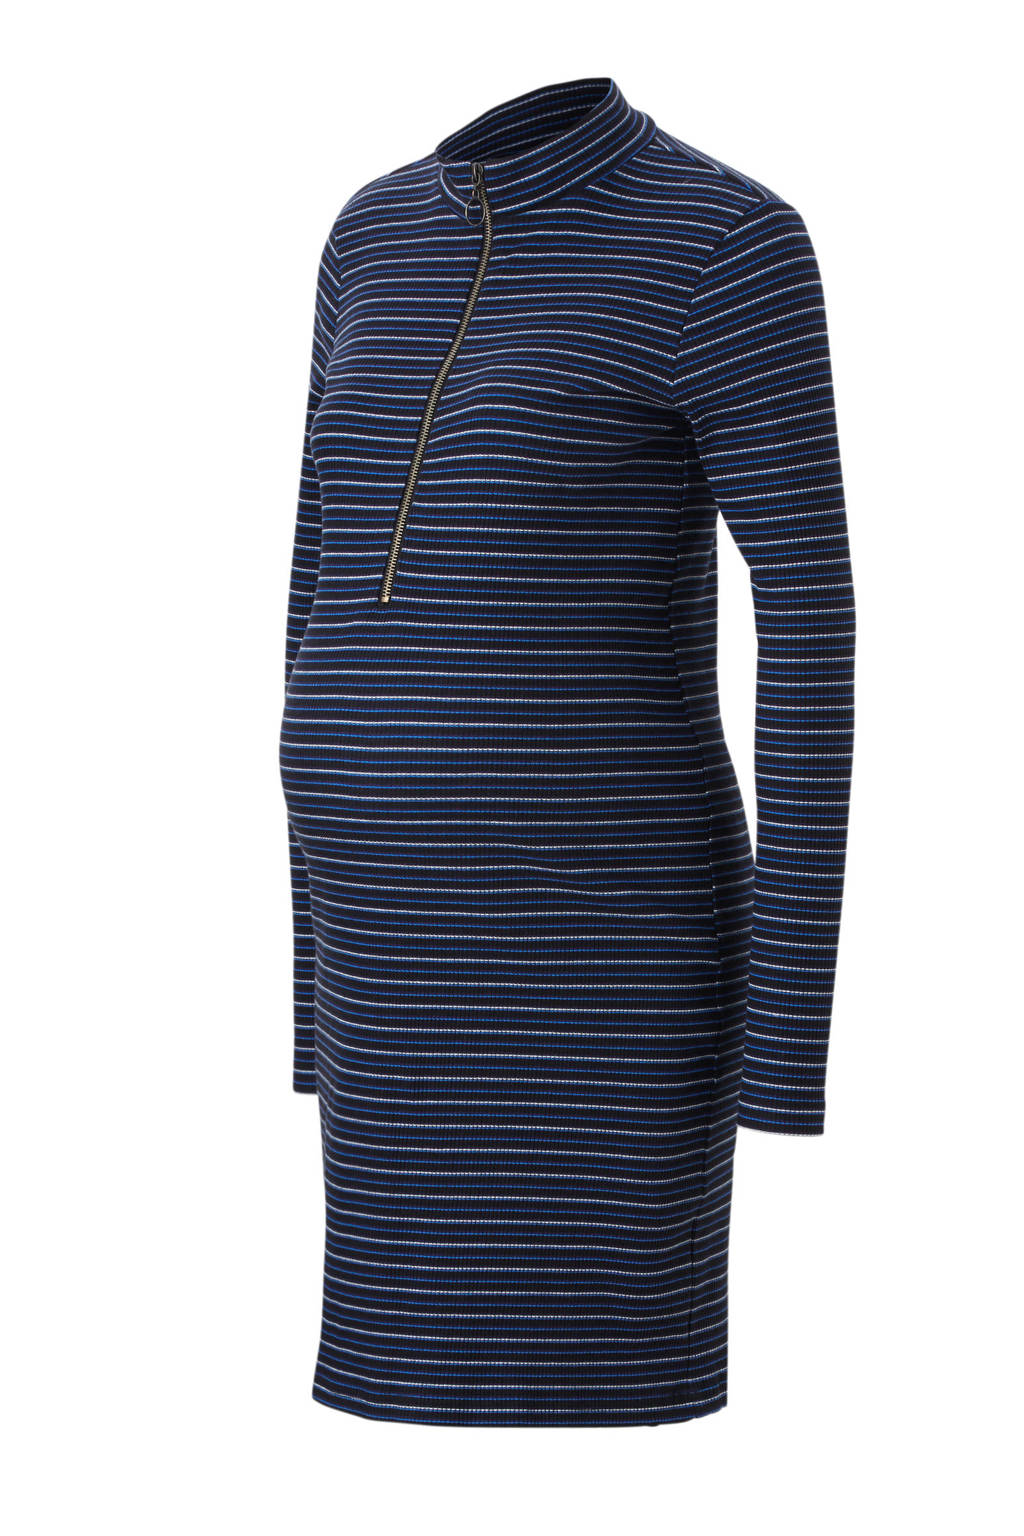 MAMA-LICIOUS jurk met streepdessin, Zwart